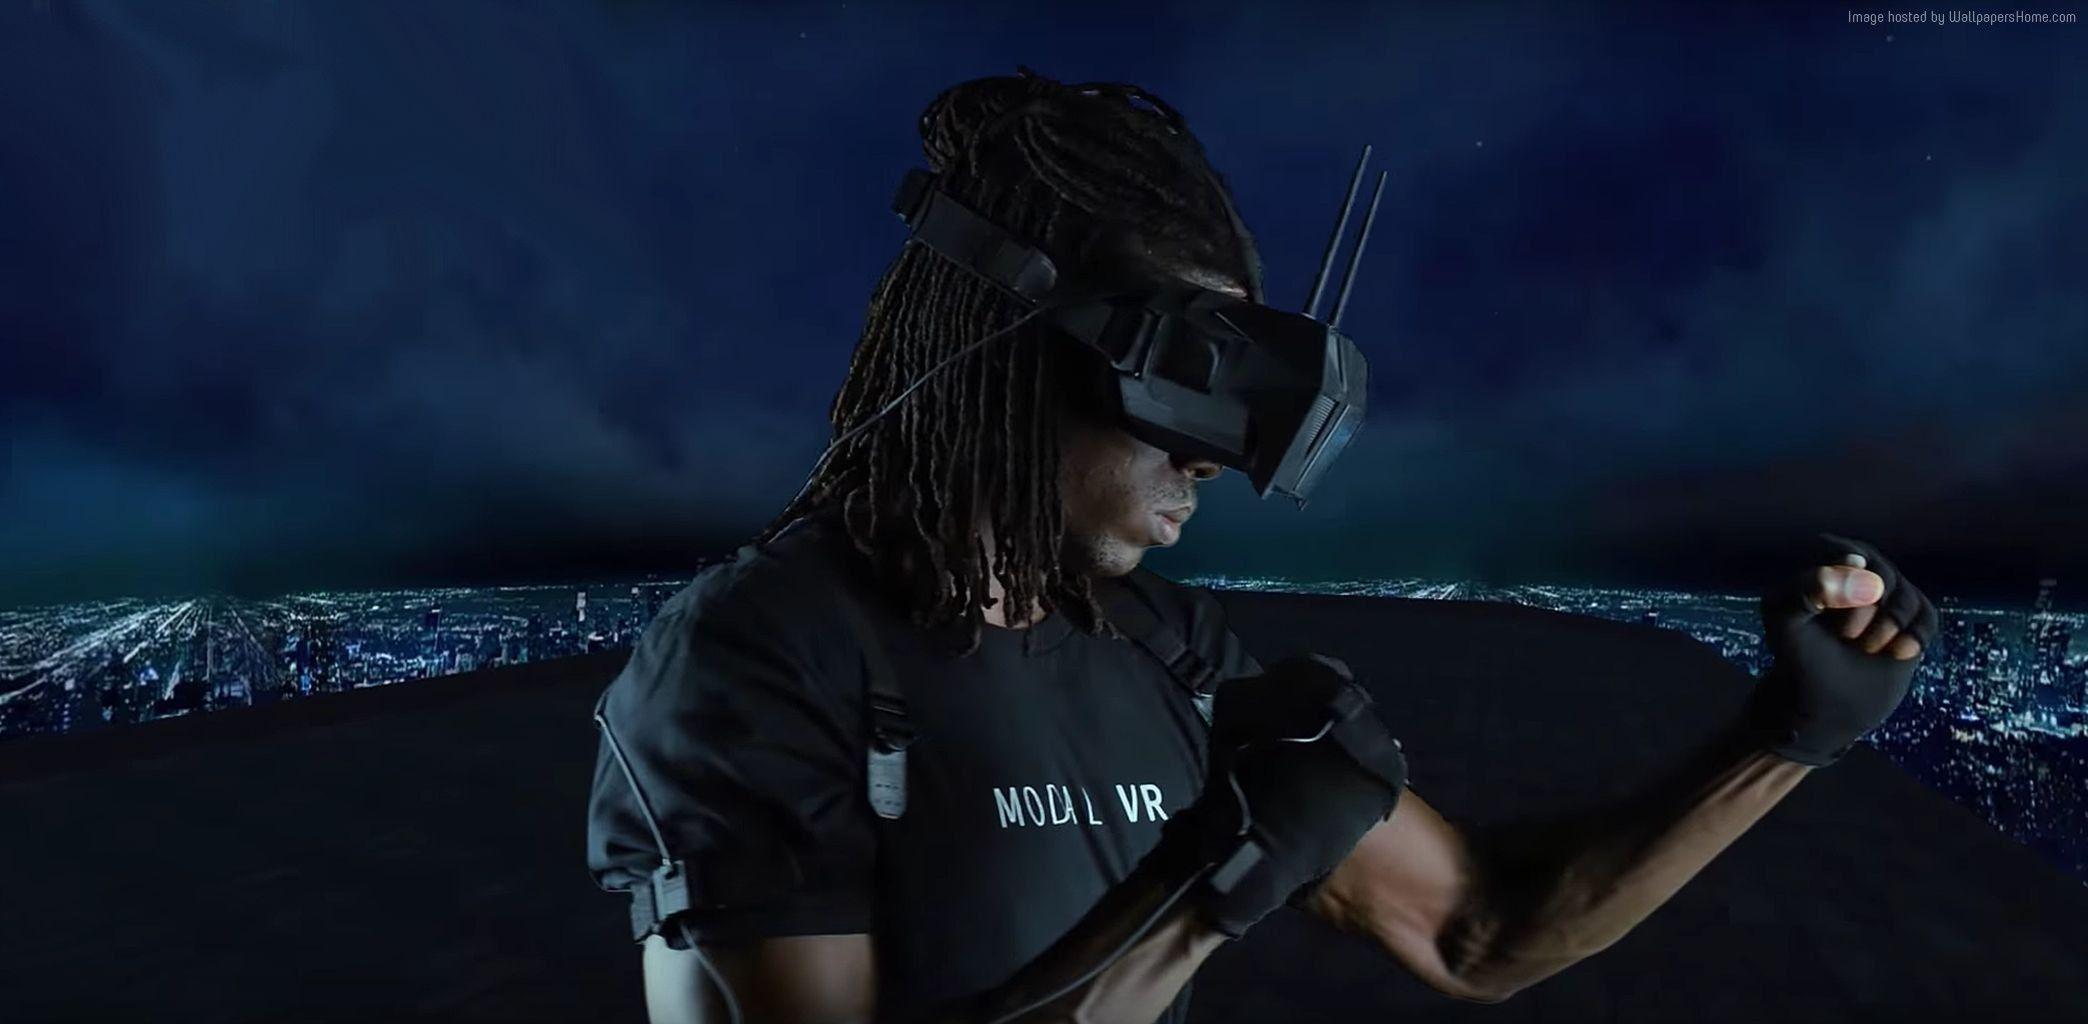 Wallpaper Modal VR Atari Virtual Reality Headset Hi